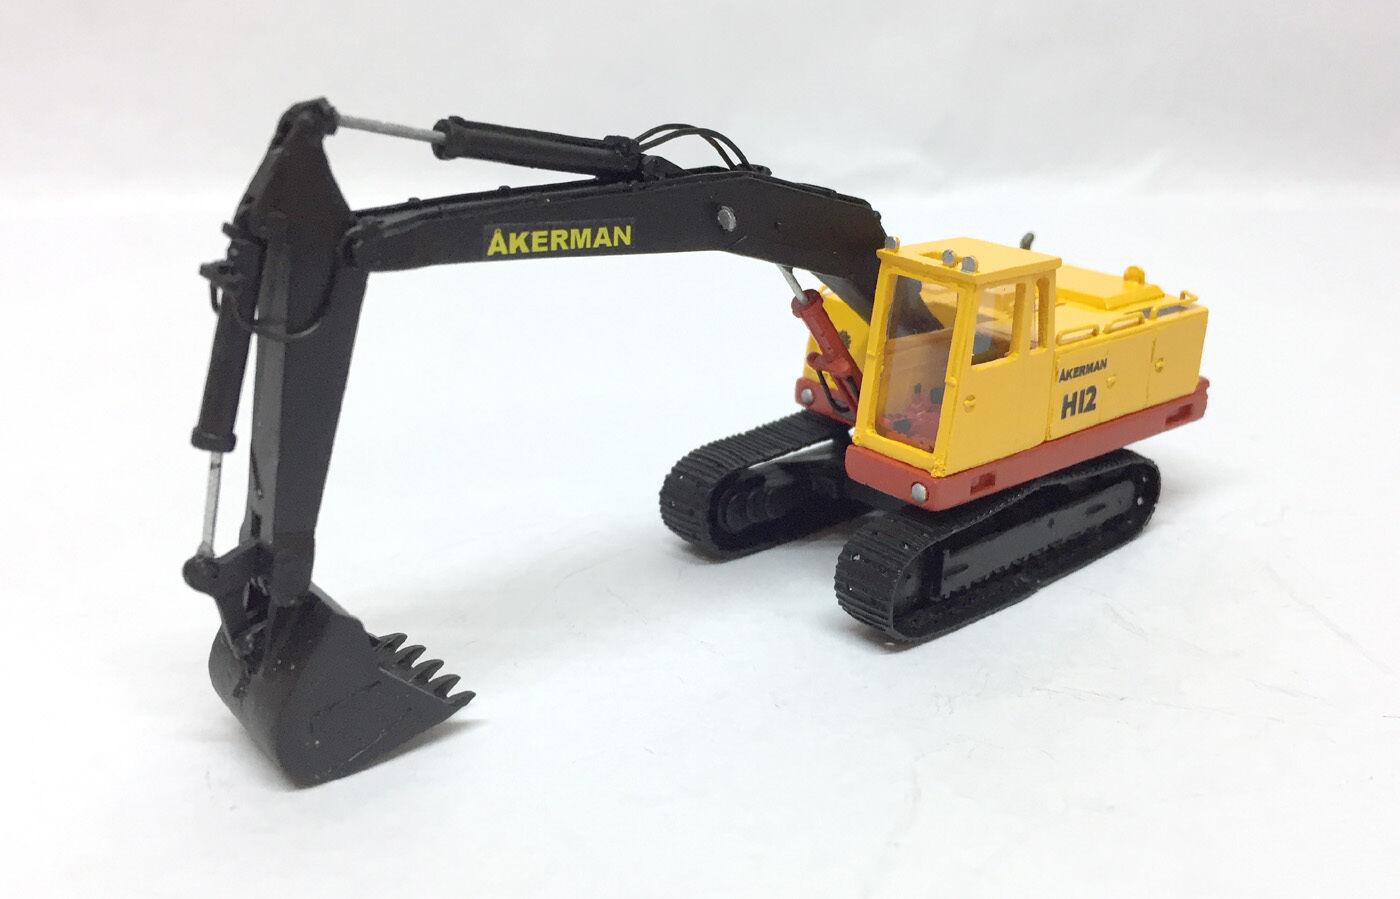 Modelo terminado resin ho 1 87 excavadoras Akerman h12-fankit Models